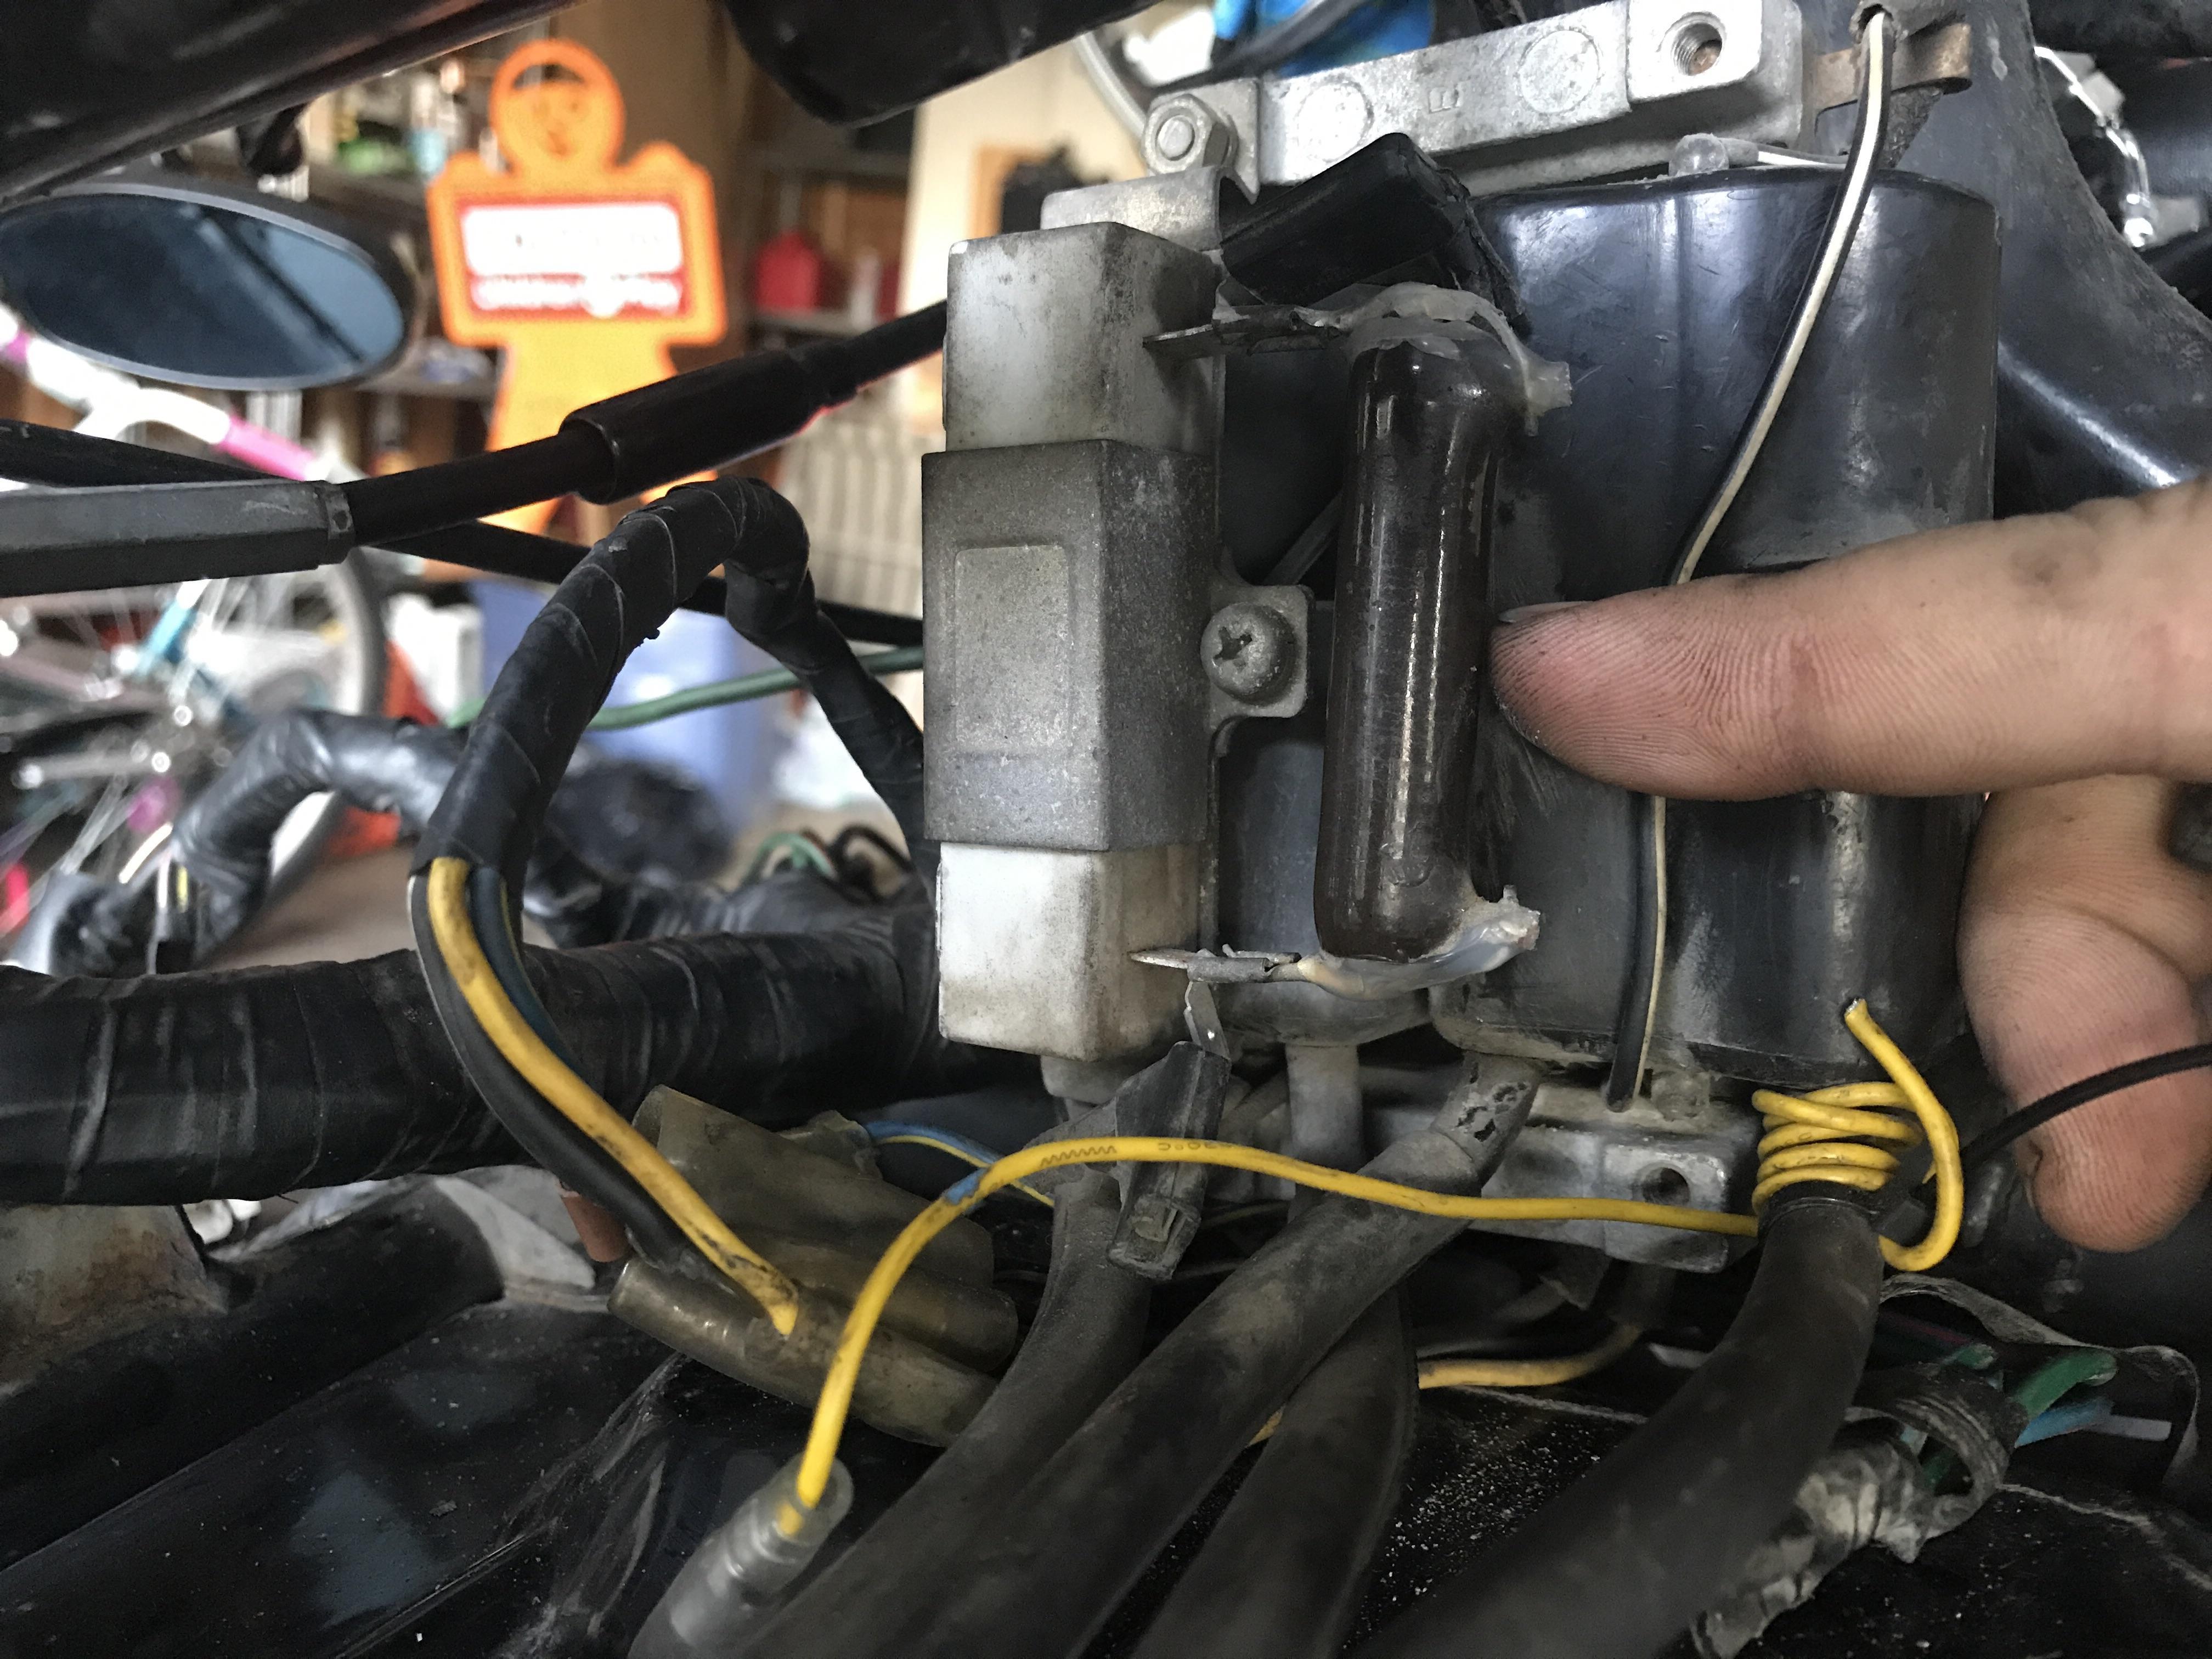 gl1000 wiring harness zs 9077  gl1000 honda goldwing wiring diagram also 1979 honda  gl1000 honda goldwing wiring diagram